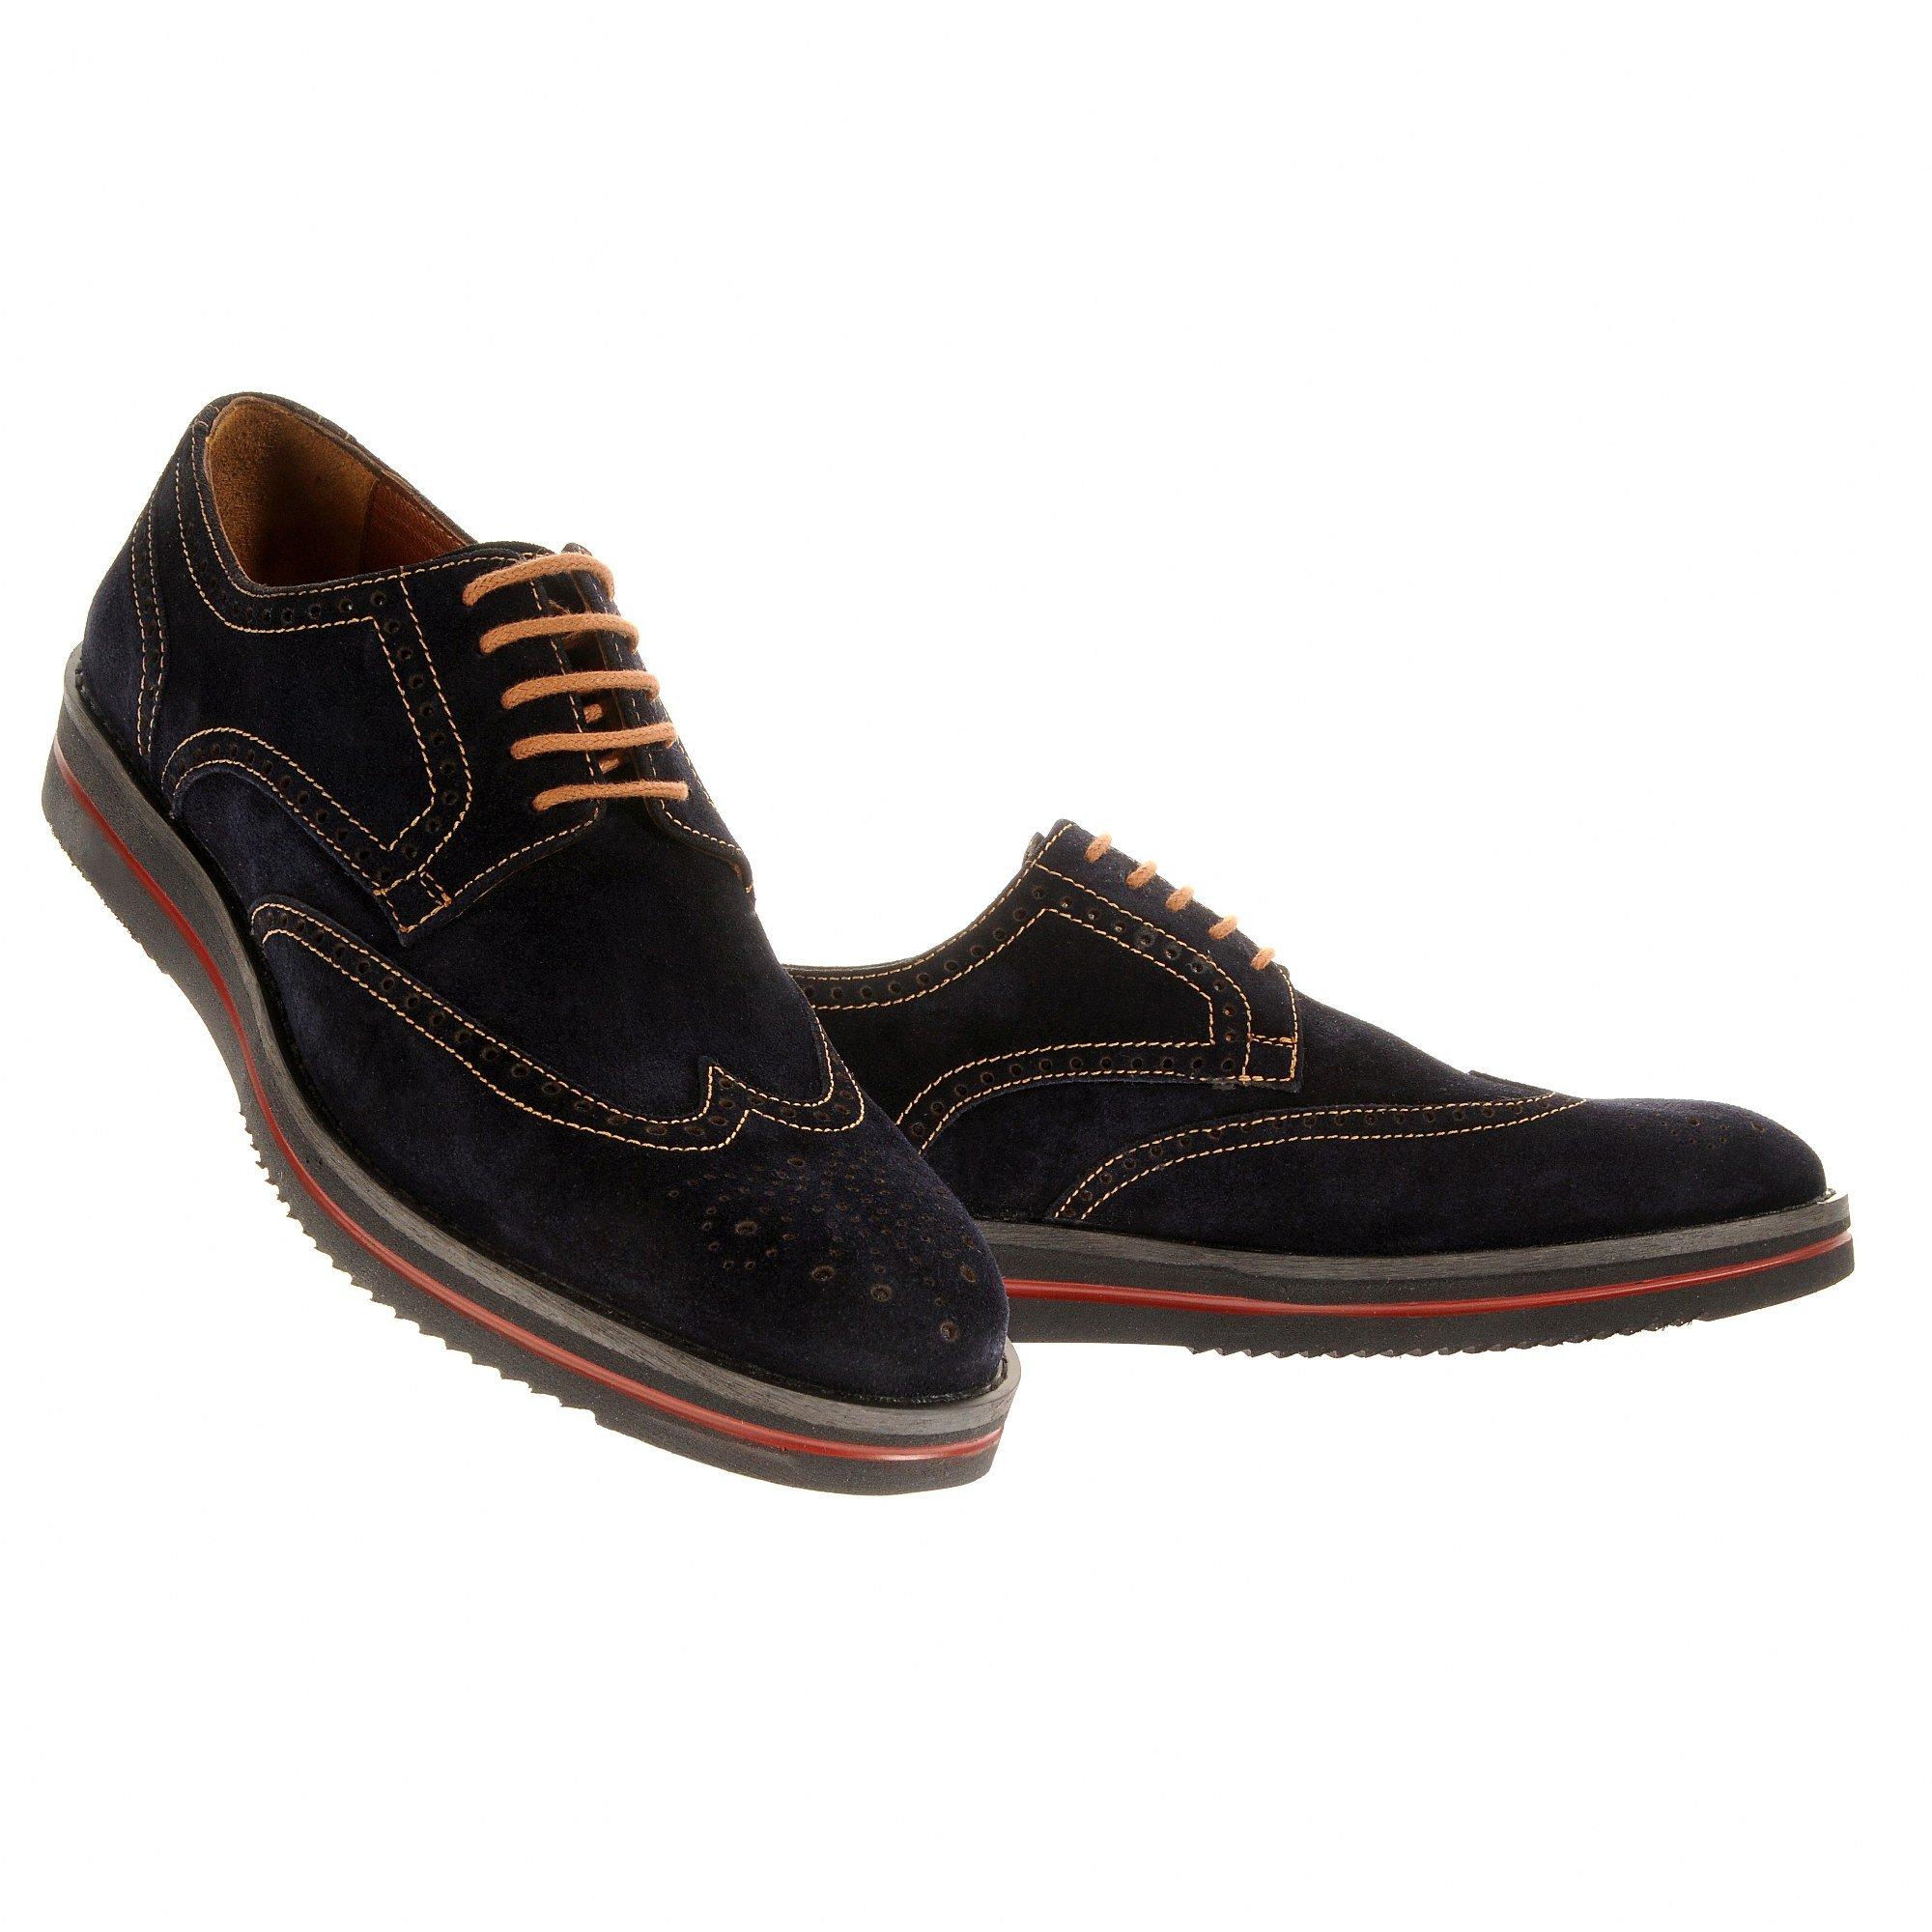 Muske Cipele Beograd #409 - muške cipele, muške cipele beograd, muska obuca, kozna, od koze, izvrnute koze, teget, plave, braon, cene, cena, cijena, online, firmirane muske cipele, odela muška, muški sakoi, kaputi, kosulje veliki brojevi, prodaja obuce, prodaja cipela, prodaja muske obuce